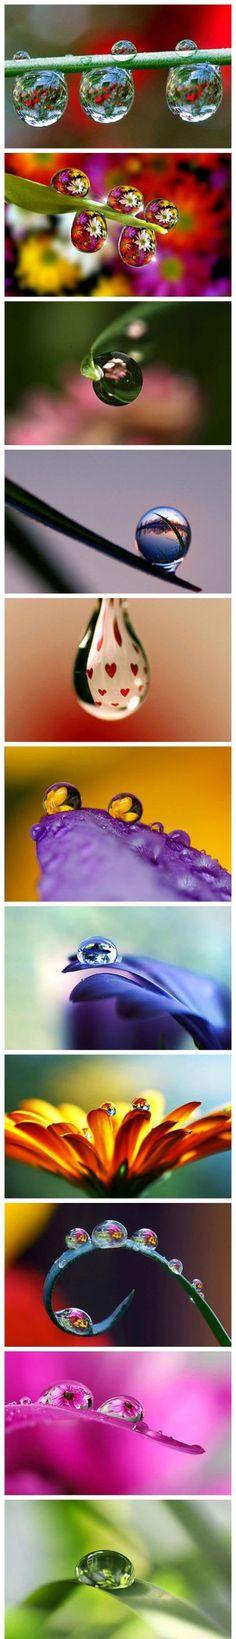 Gotas de roco  Gotas de roco Gotas y Gotas de agua